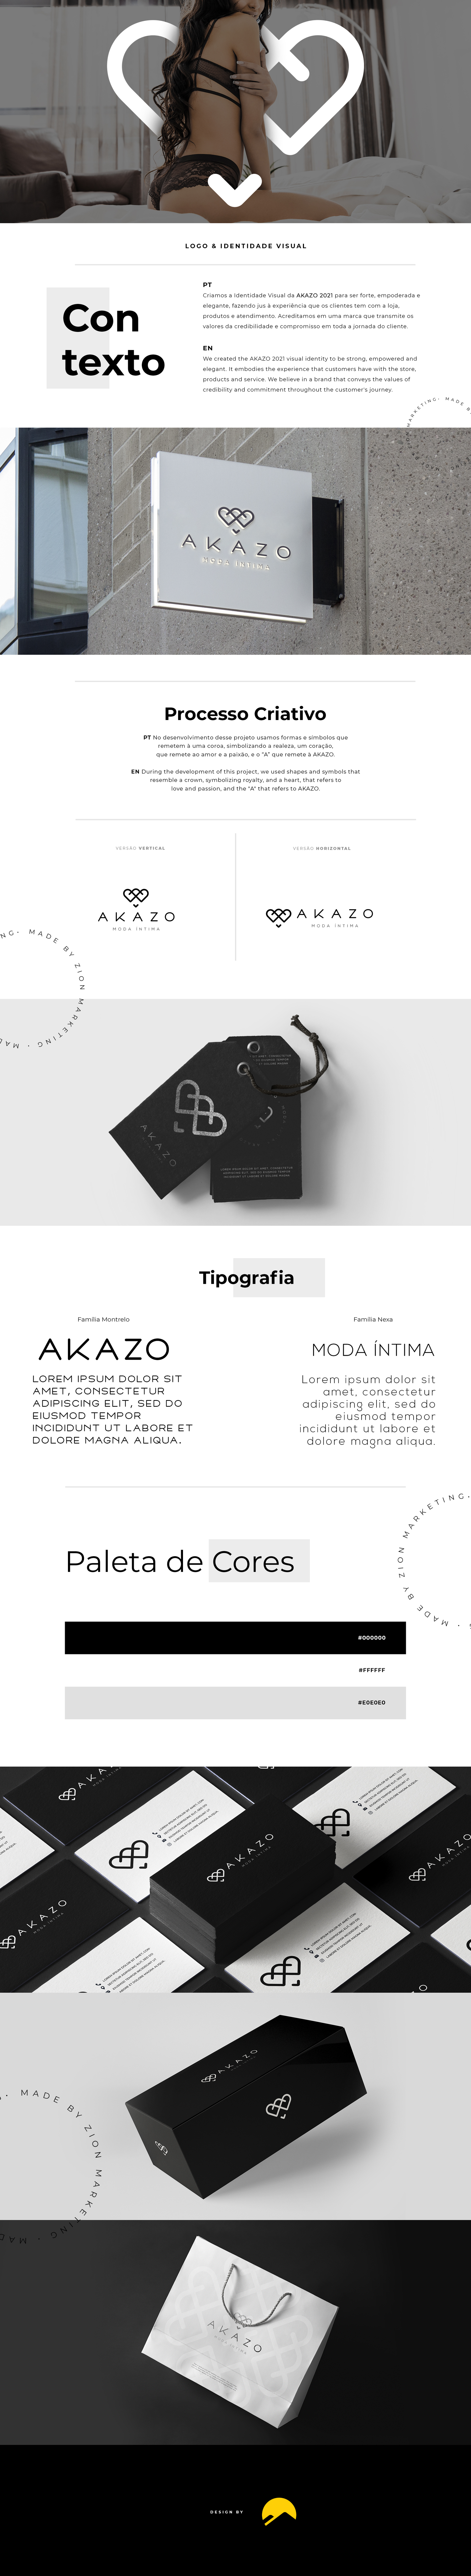 Akazo Moda Íntima - Desktop